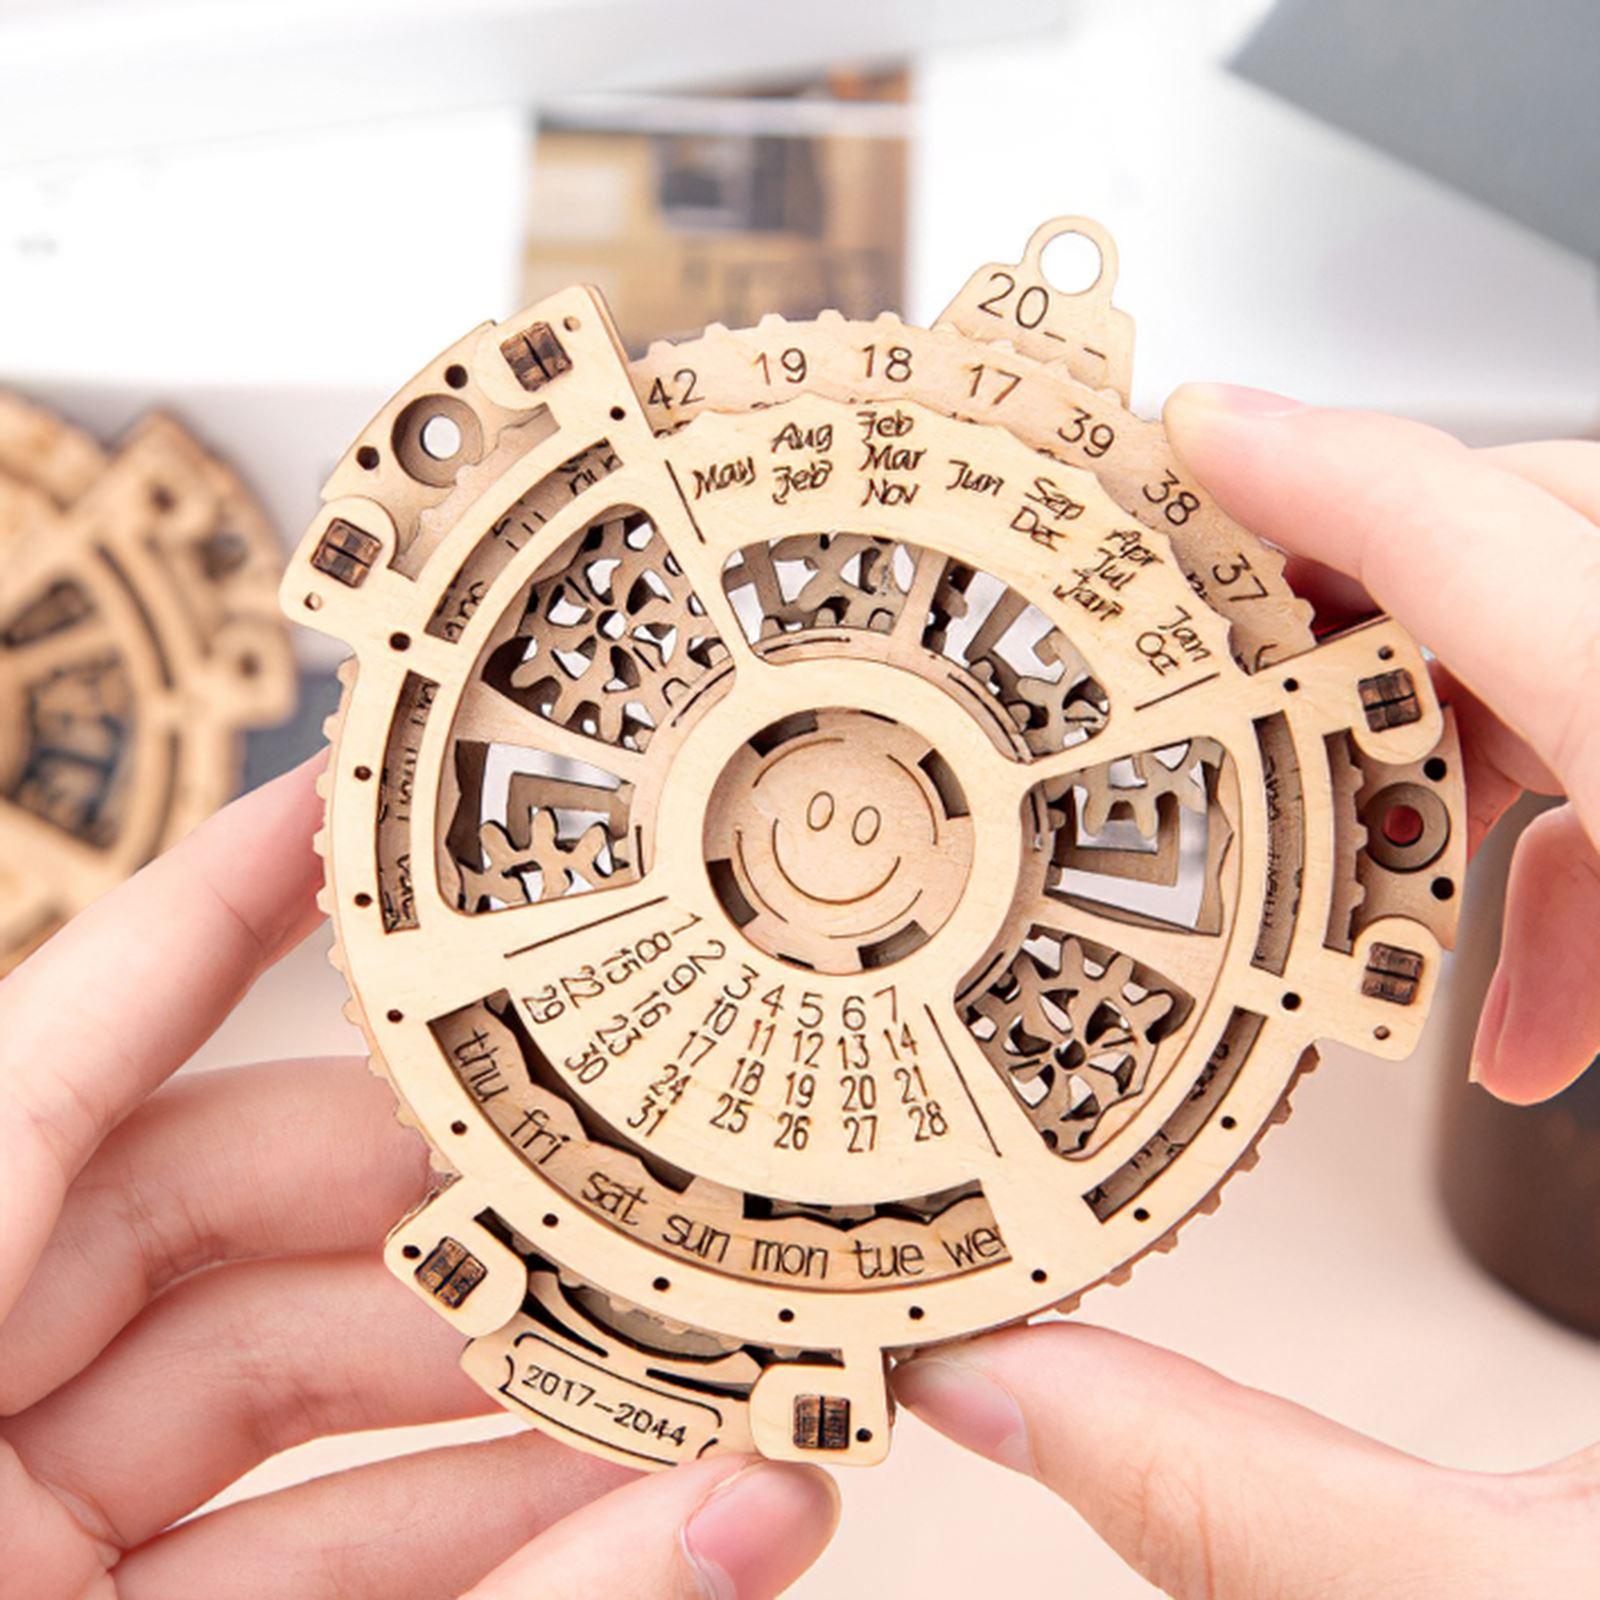 DIY Toy Perpetual Calendar Model Creativity Simple Desktop Ornaments Assembled Educational Toys Carved Wooden Assembling